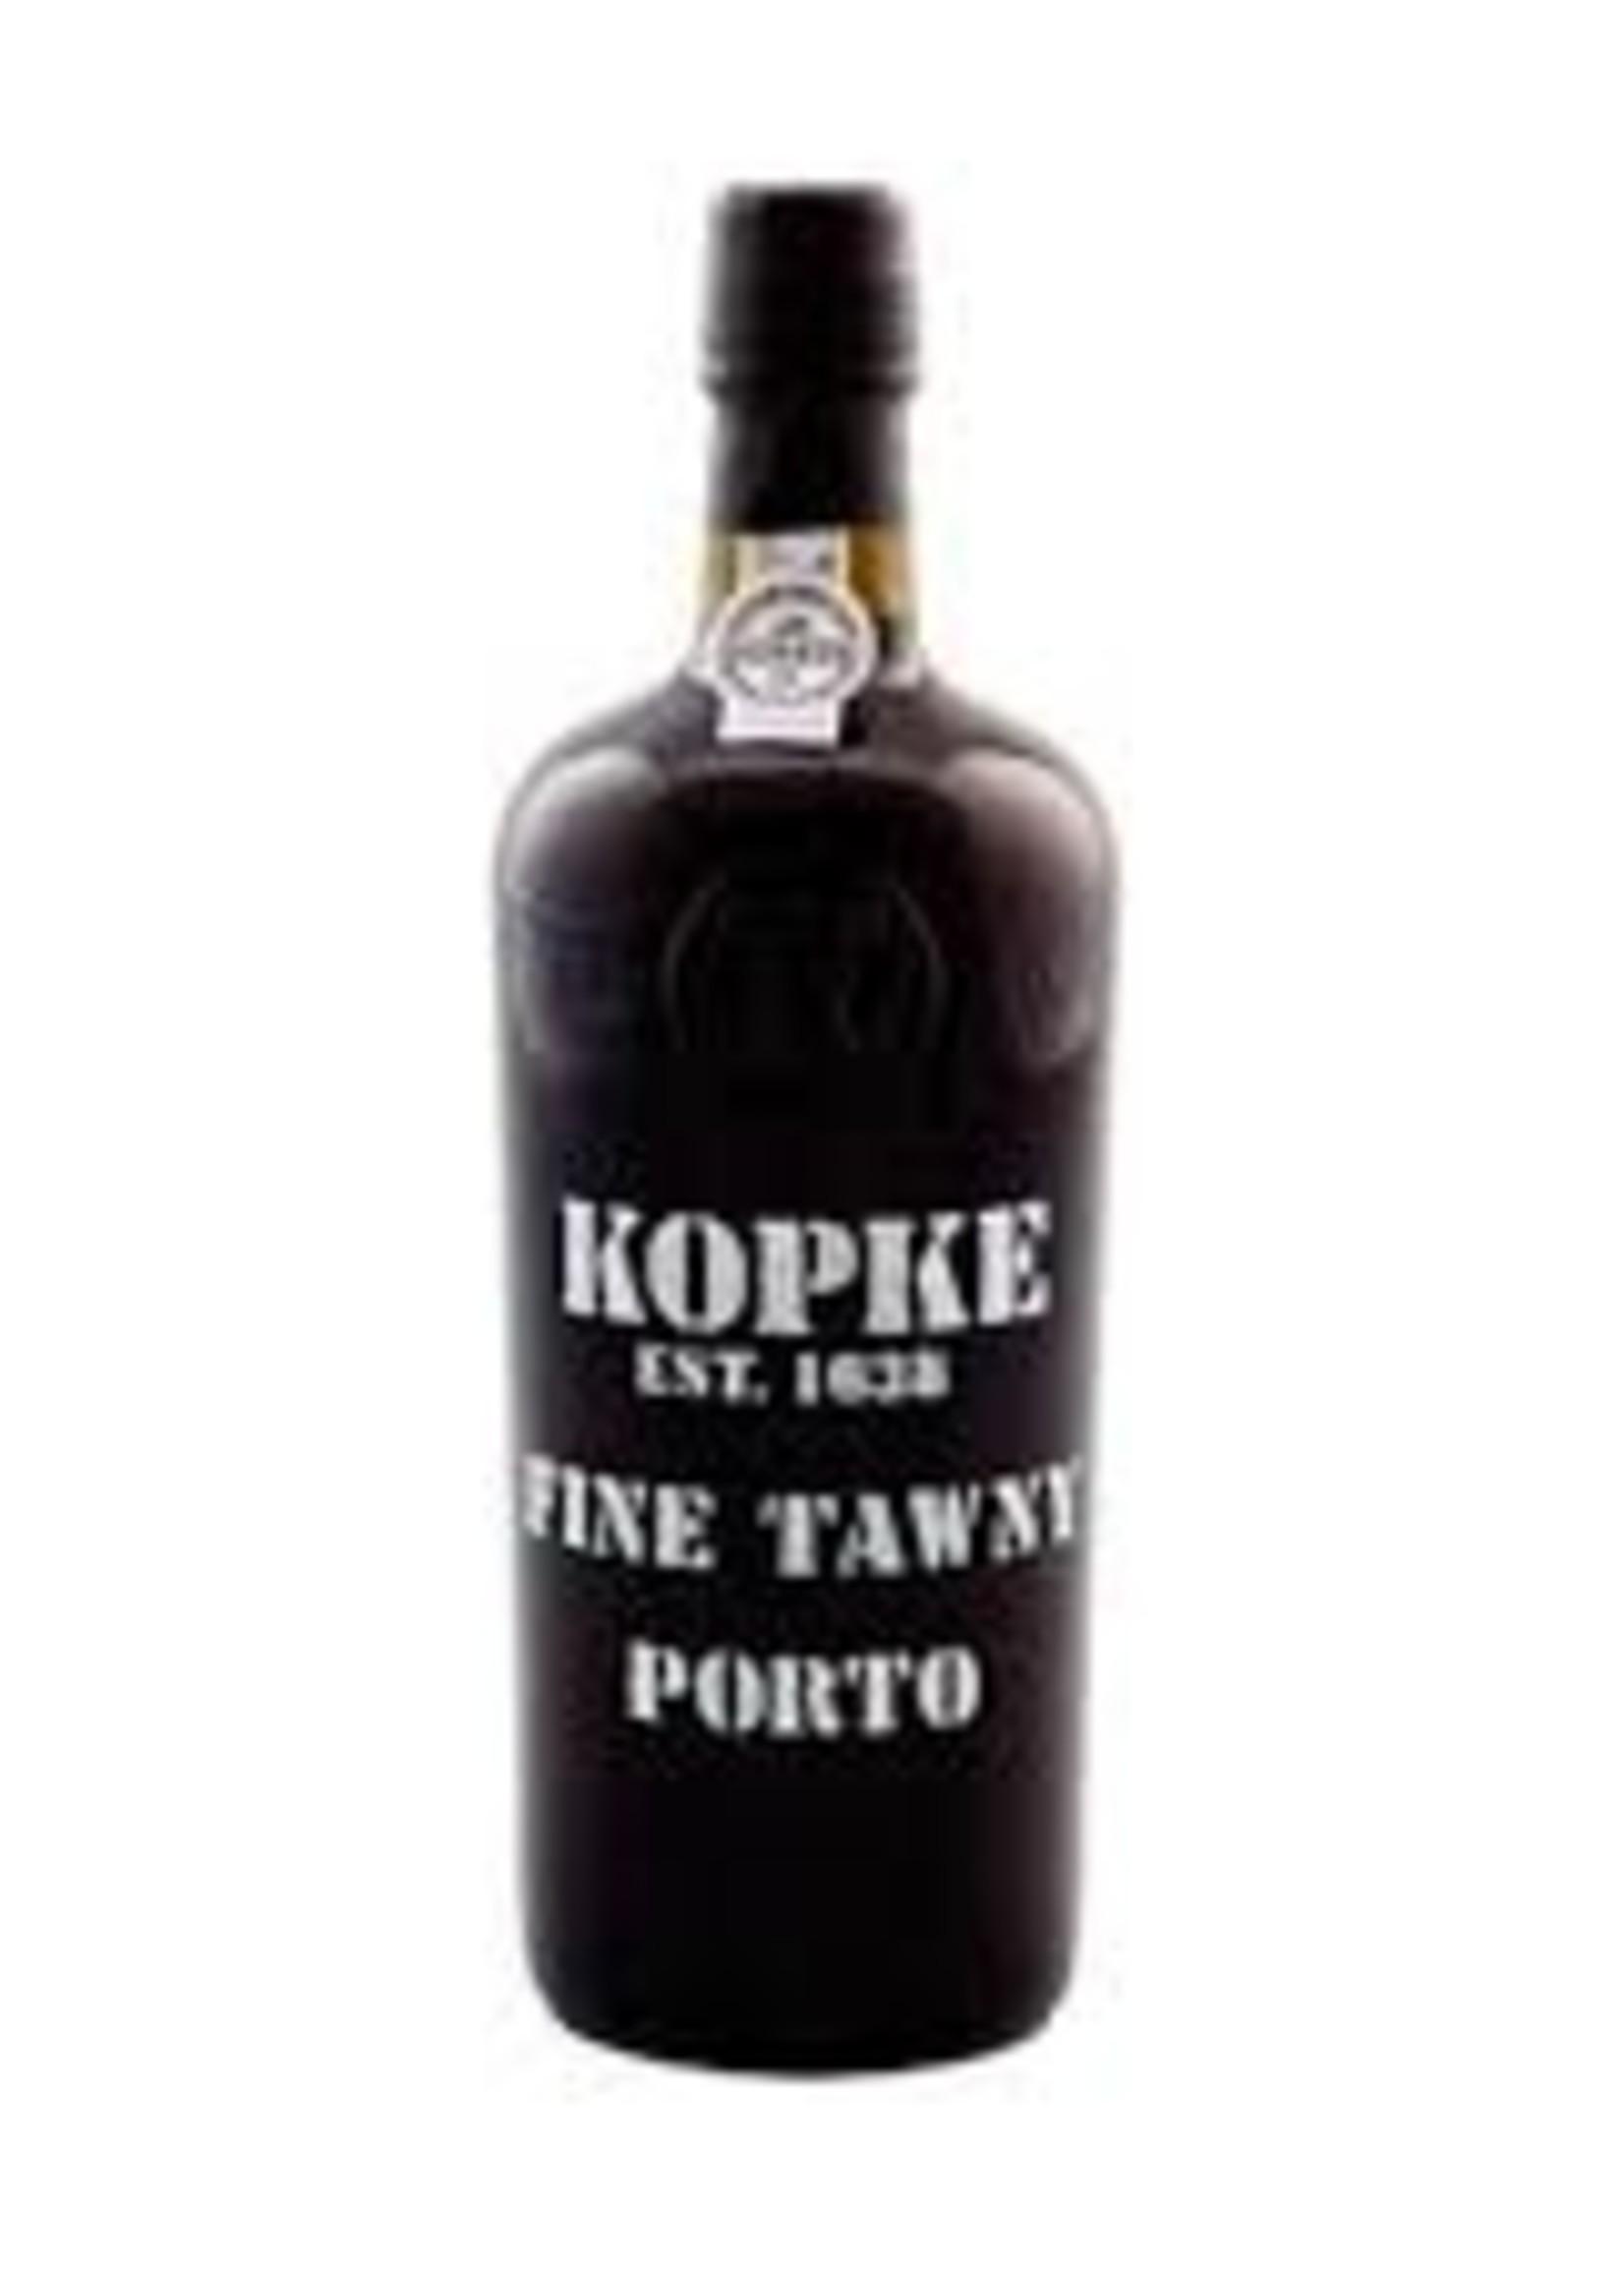 Porto Kopke Fine Tawny